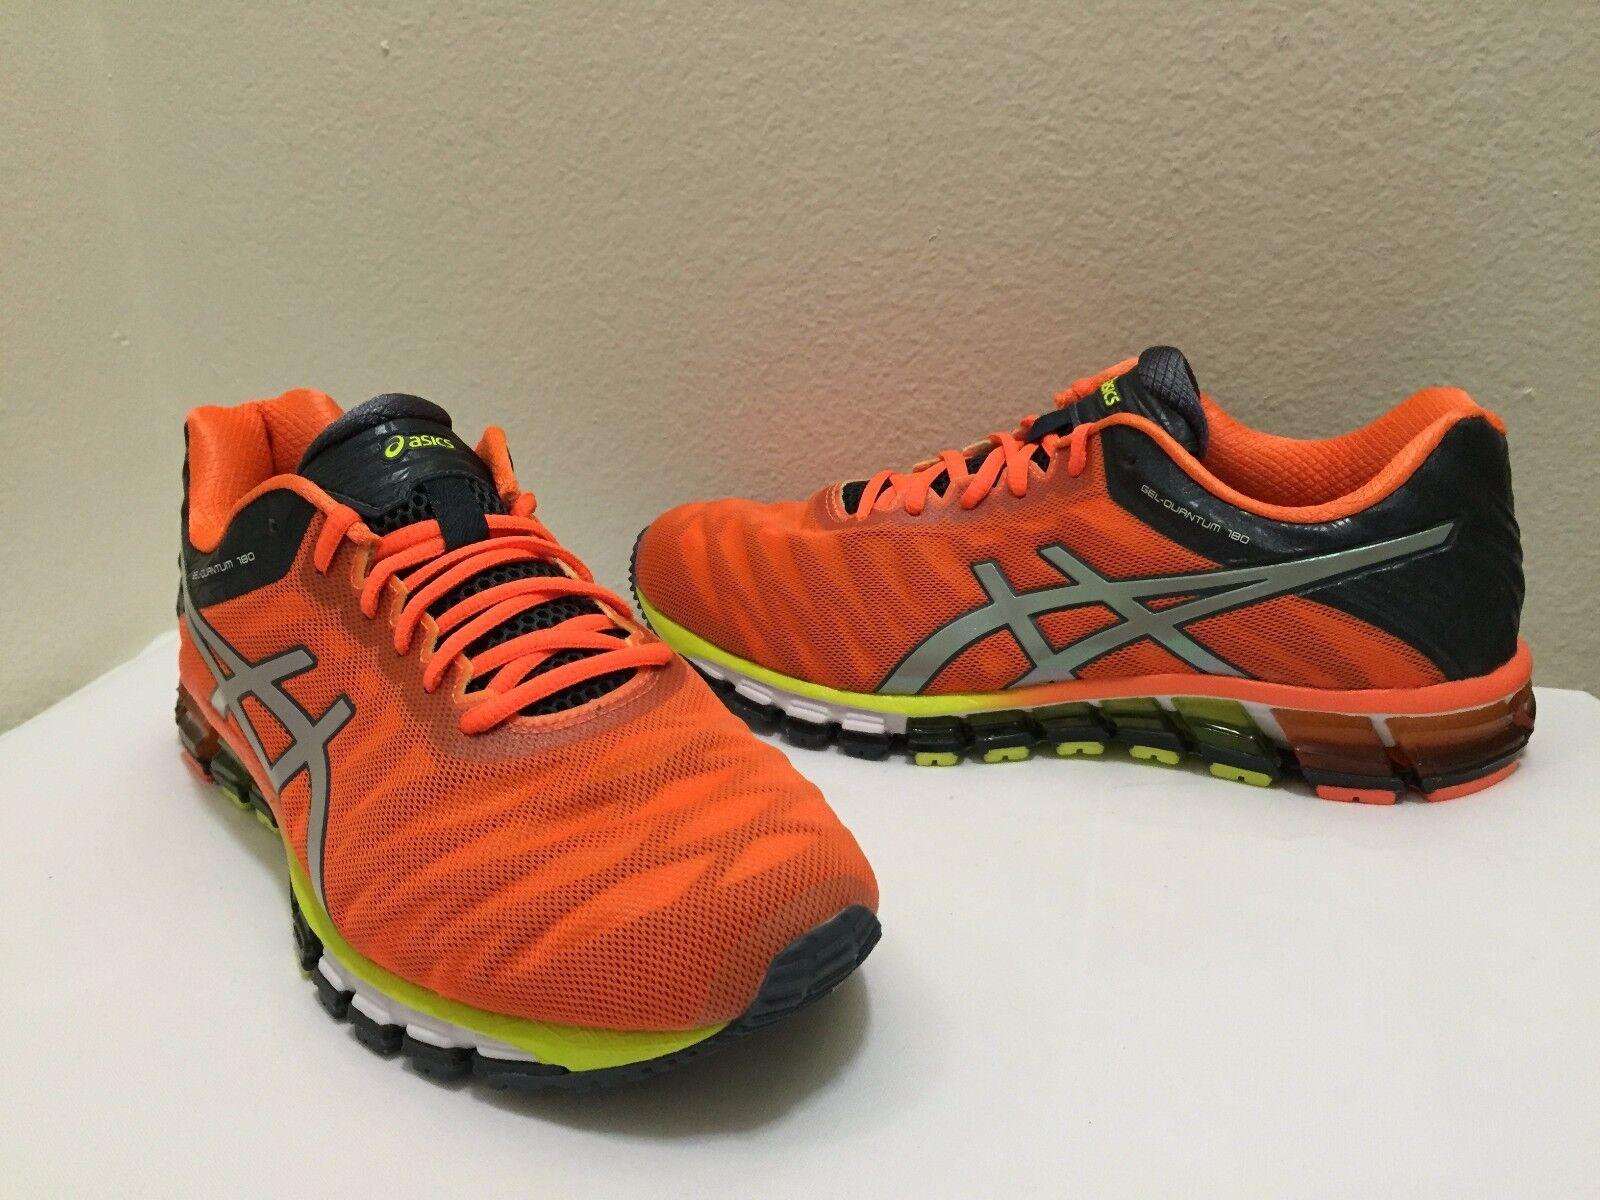 ASICS Men's Shoes GEL-Quantum 180 Running Hot Orange/Black/Silver T5J2N 3093